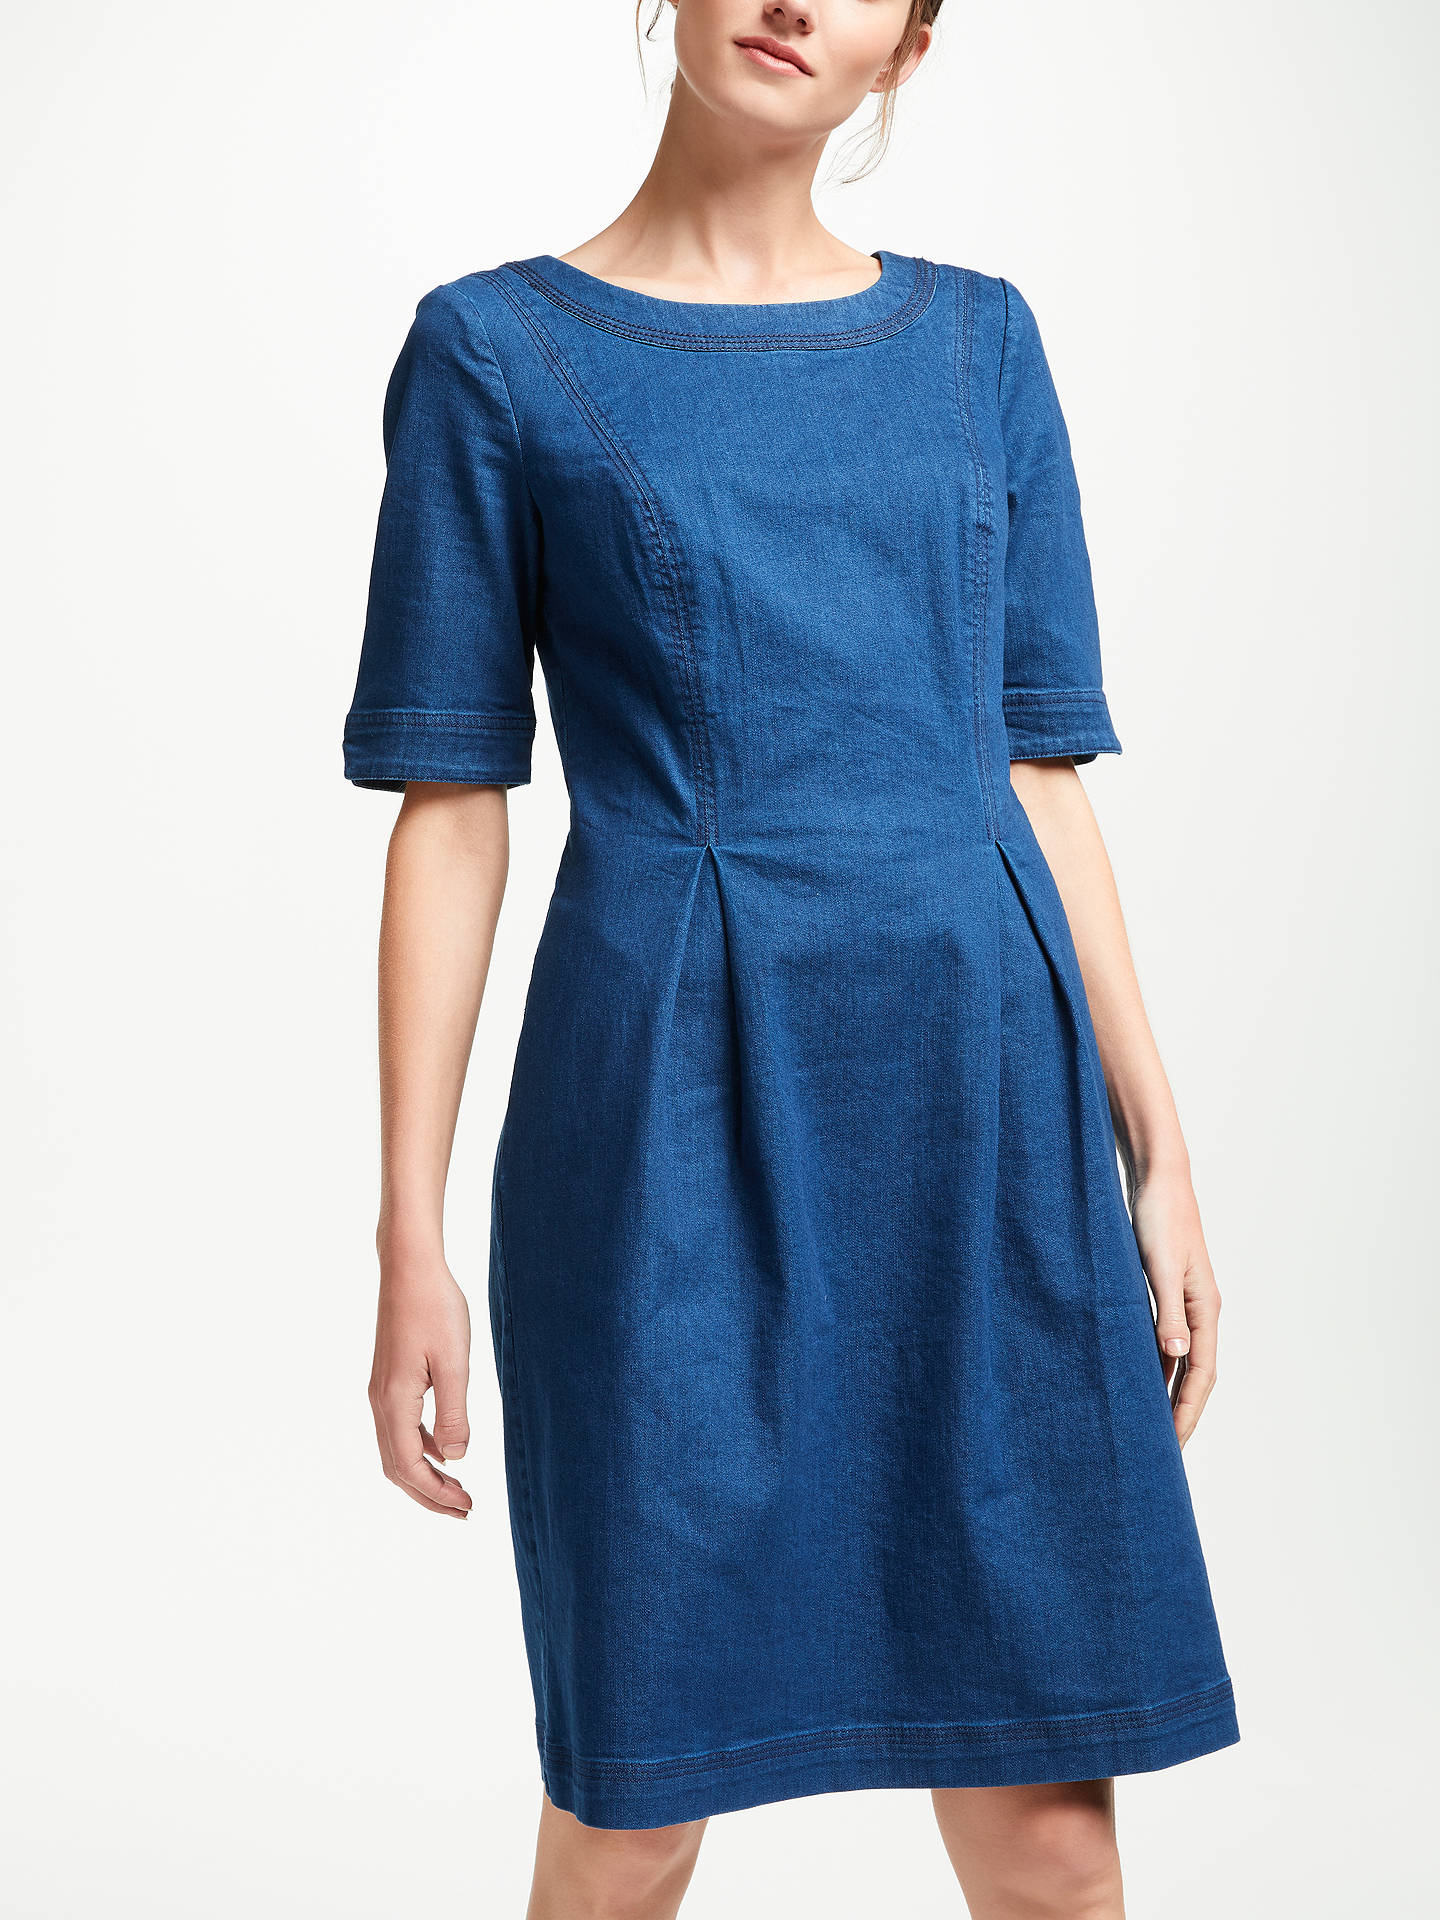 fcbc97d2d1 Buy Boden Alice Denim Dress